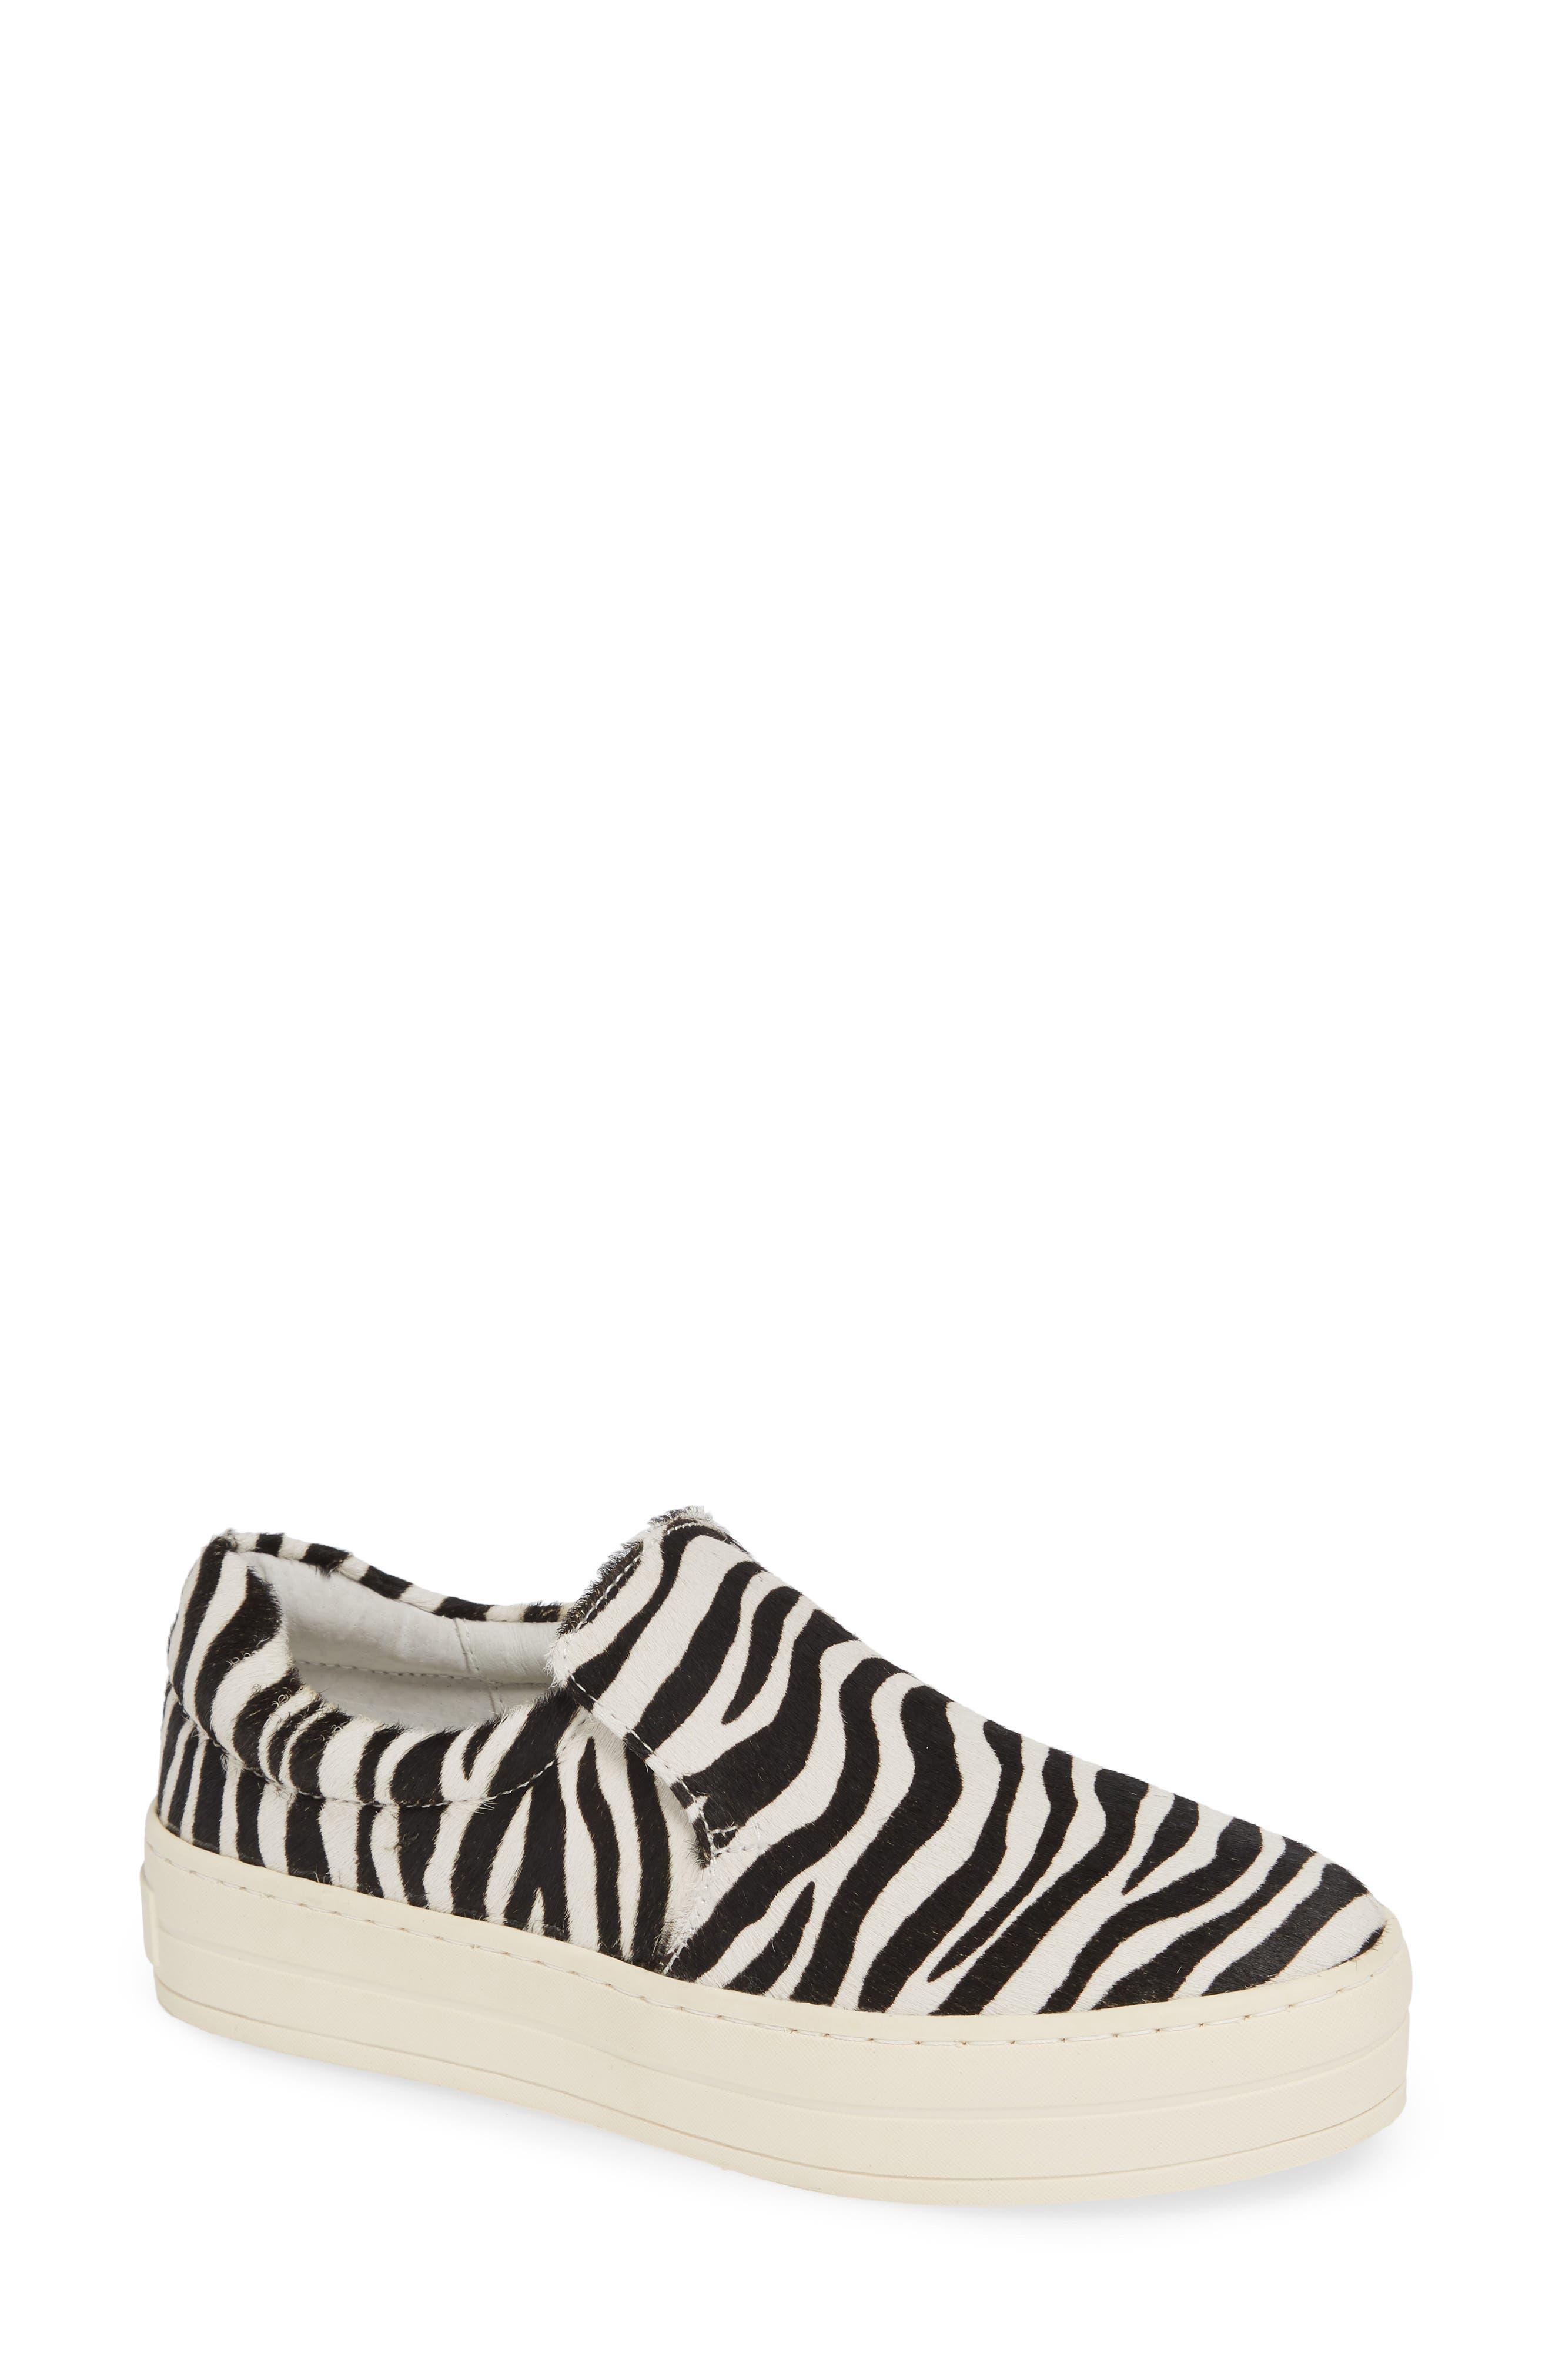 Harry Genuine Calf Hair Slip-On Sneaker in Zebra Calf Hair